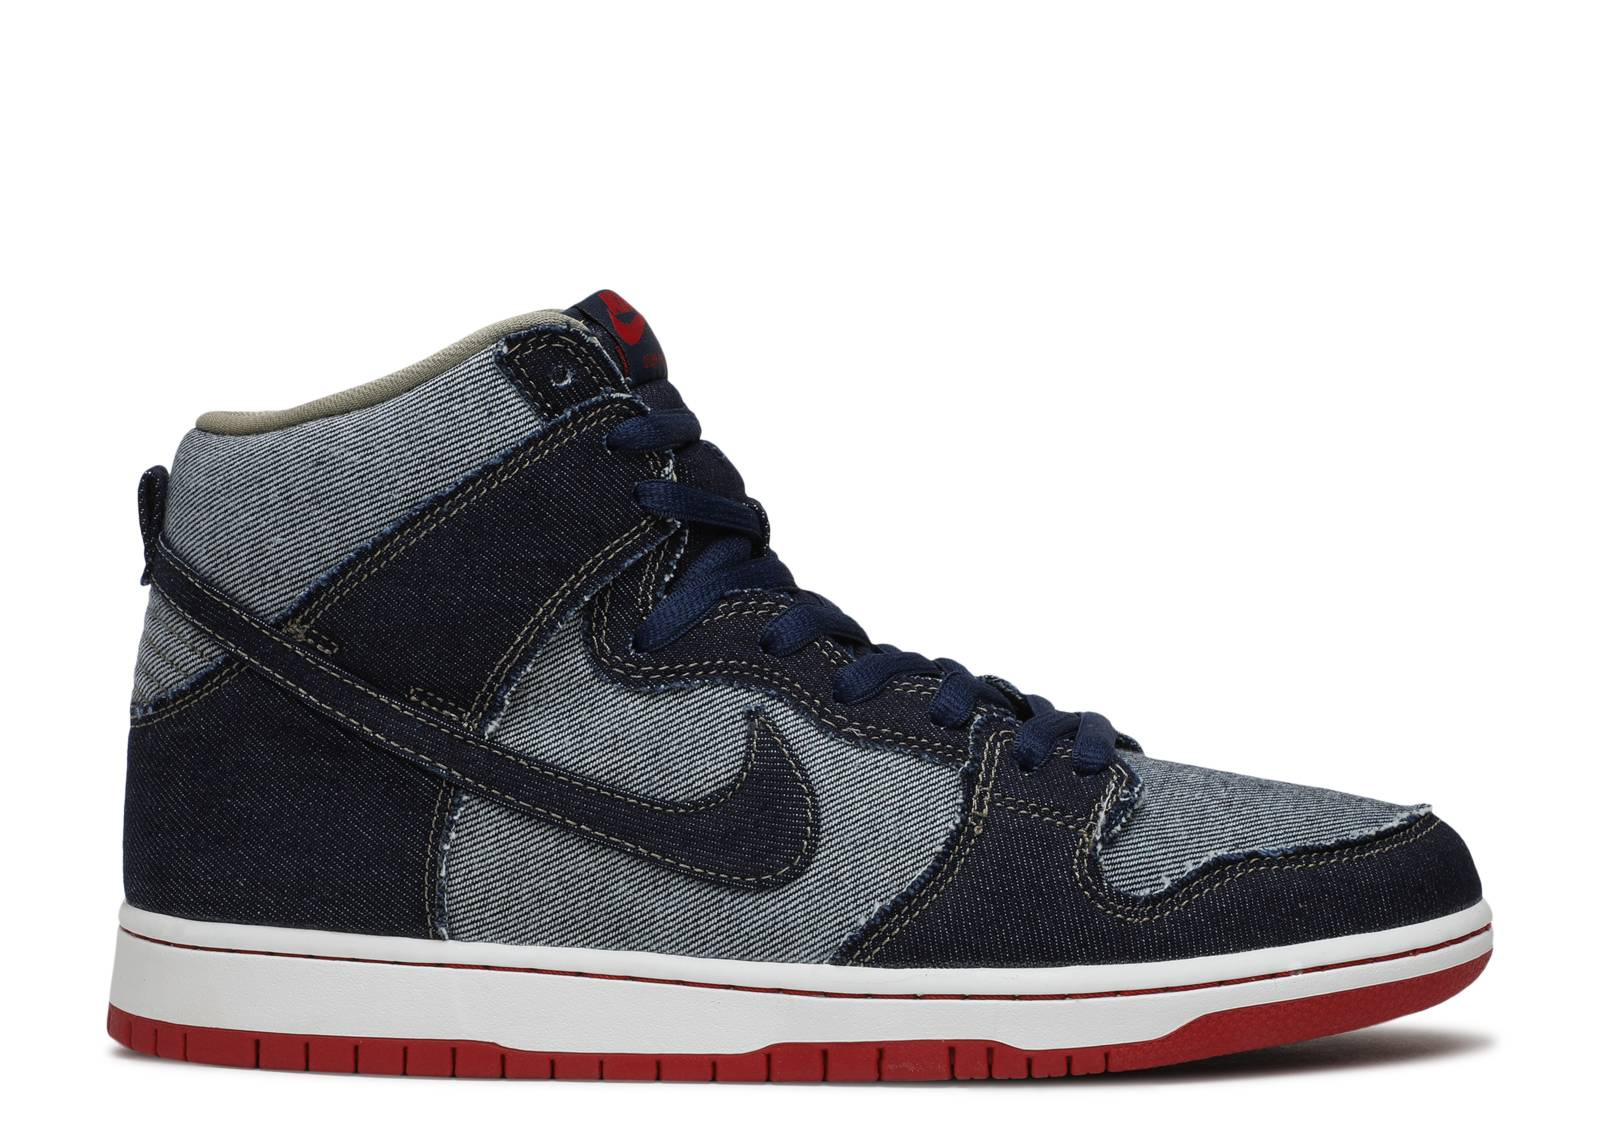 Nike SB Dunk High Premium Shoes blue